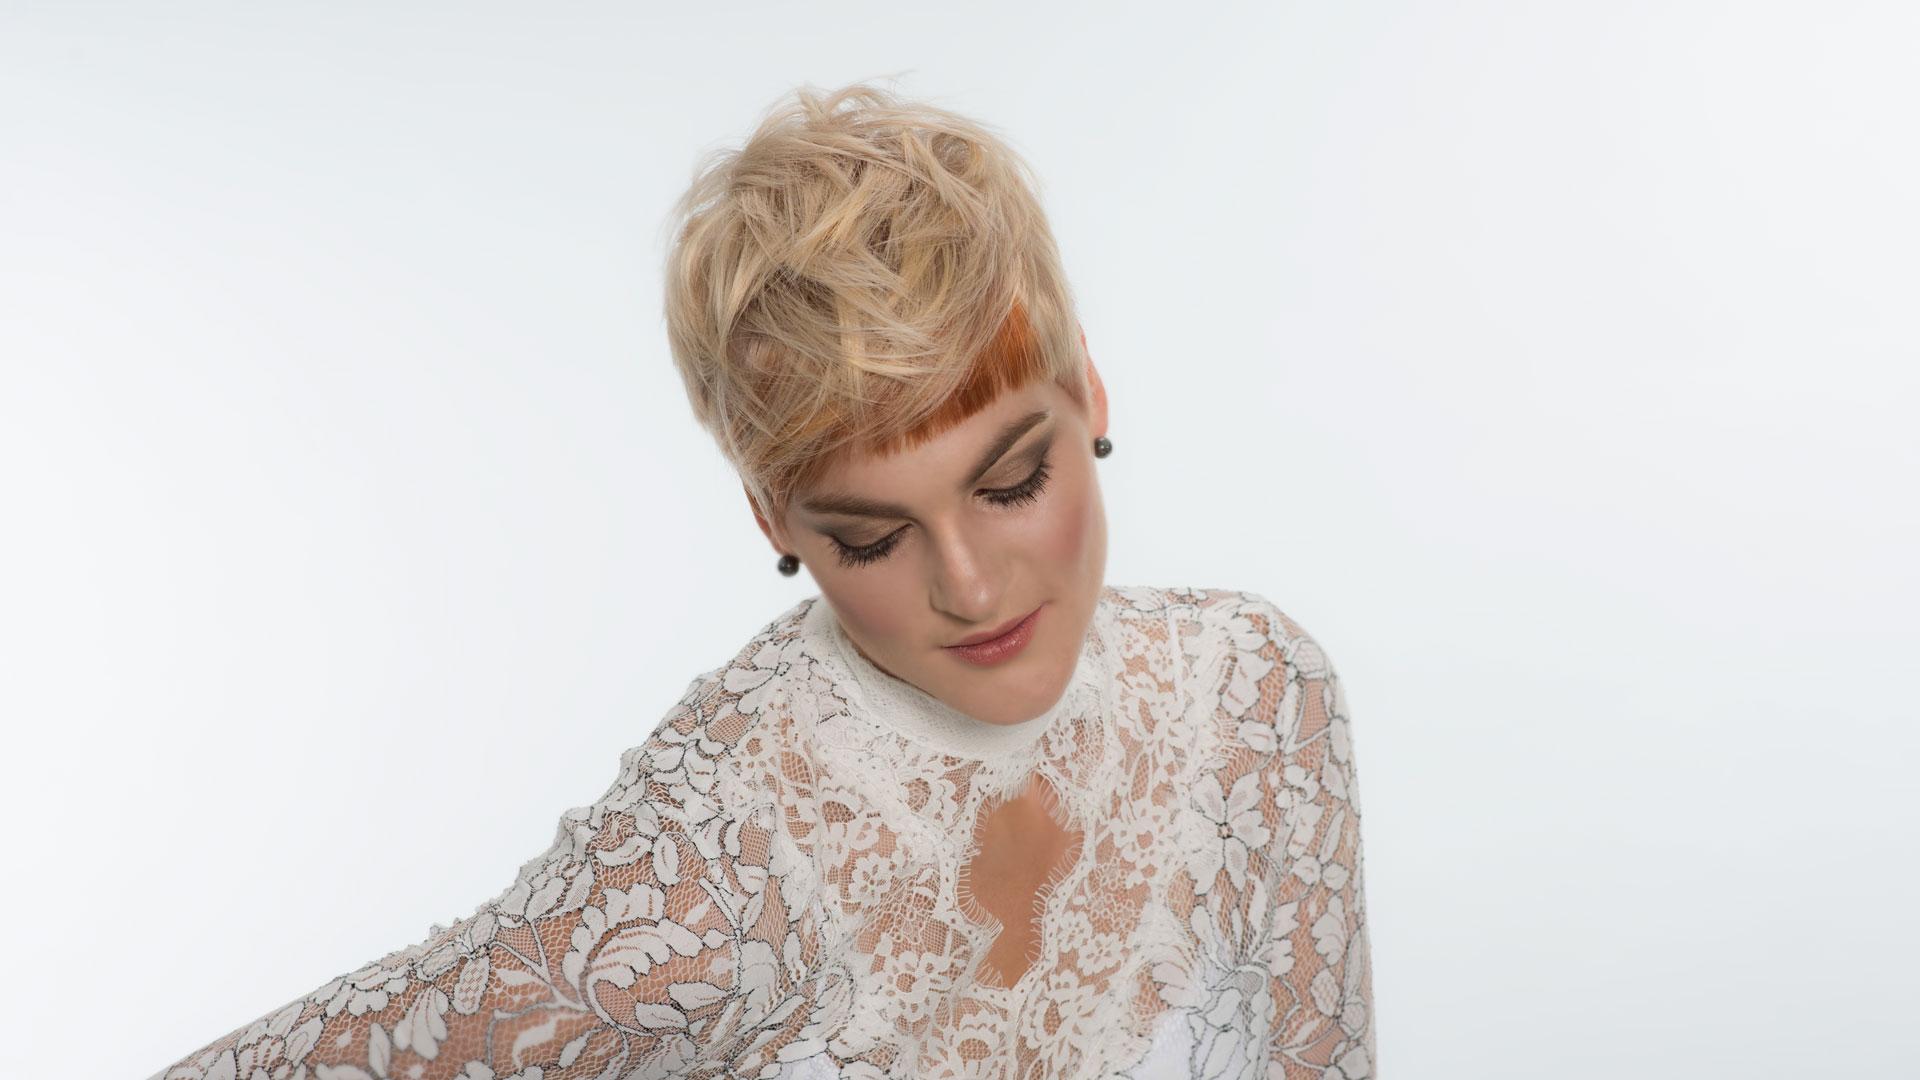 Best haircut in plano haircuts models ideas for Aalam salon dallas